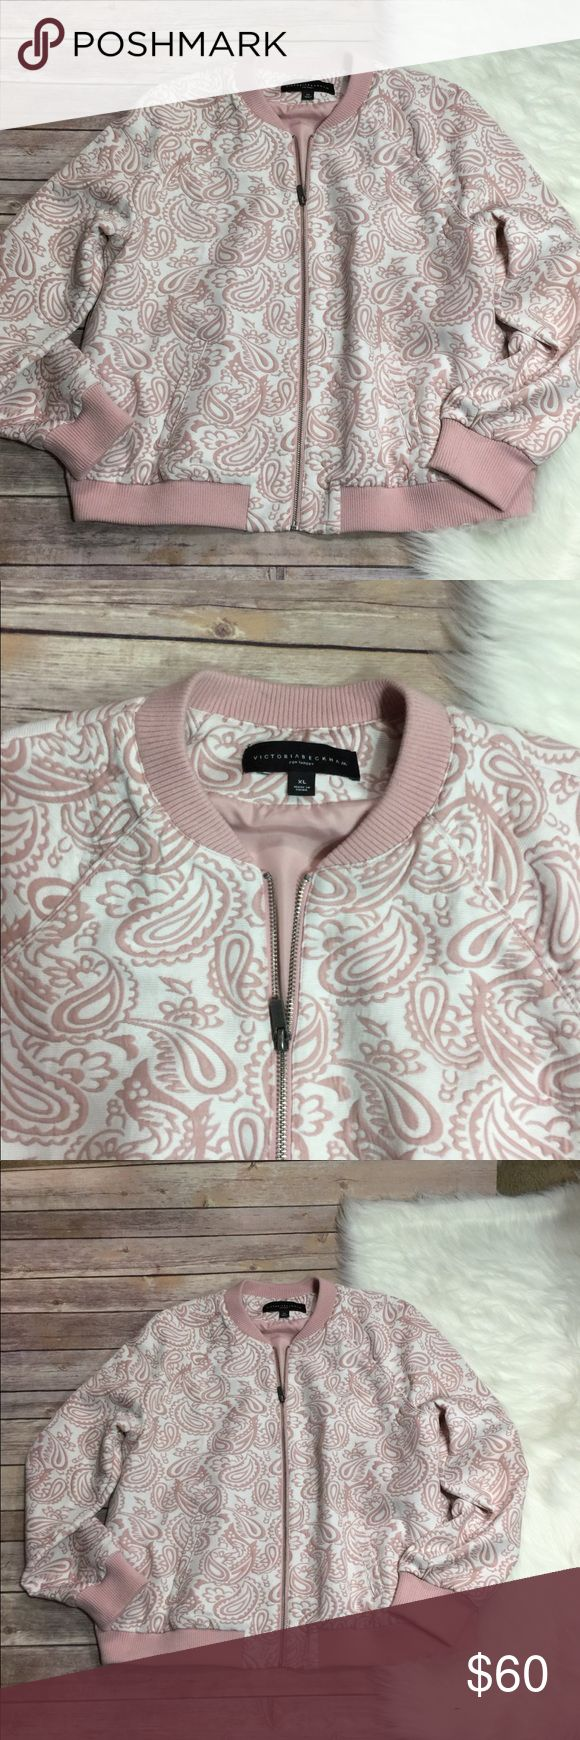 Victoria Beckham Jacket Euc floral jacket Victoria Beckham for Target Jackets & Coats